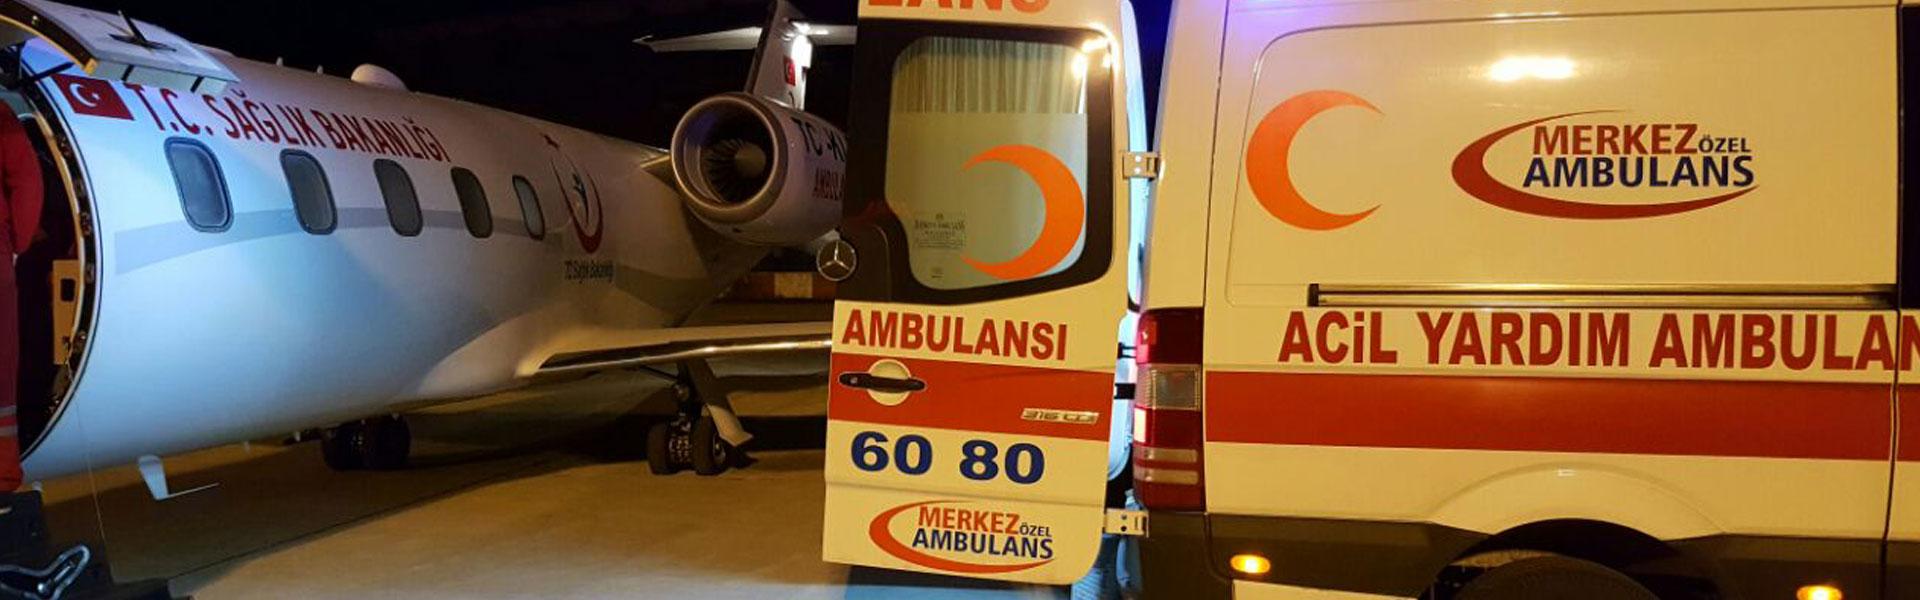 merkez-ozel-ambulans-acil-yardim-hava-ambulansi